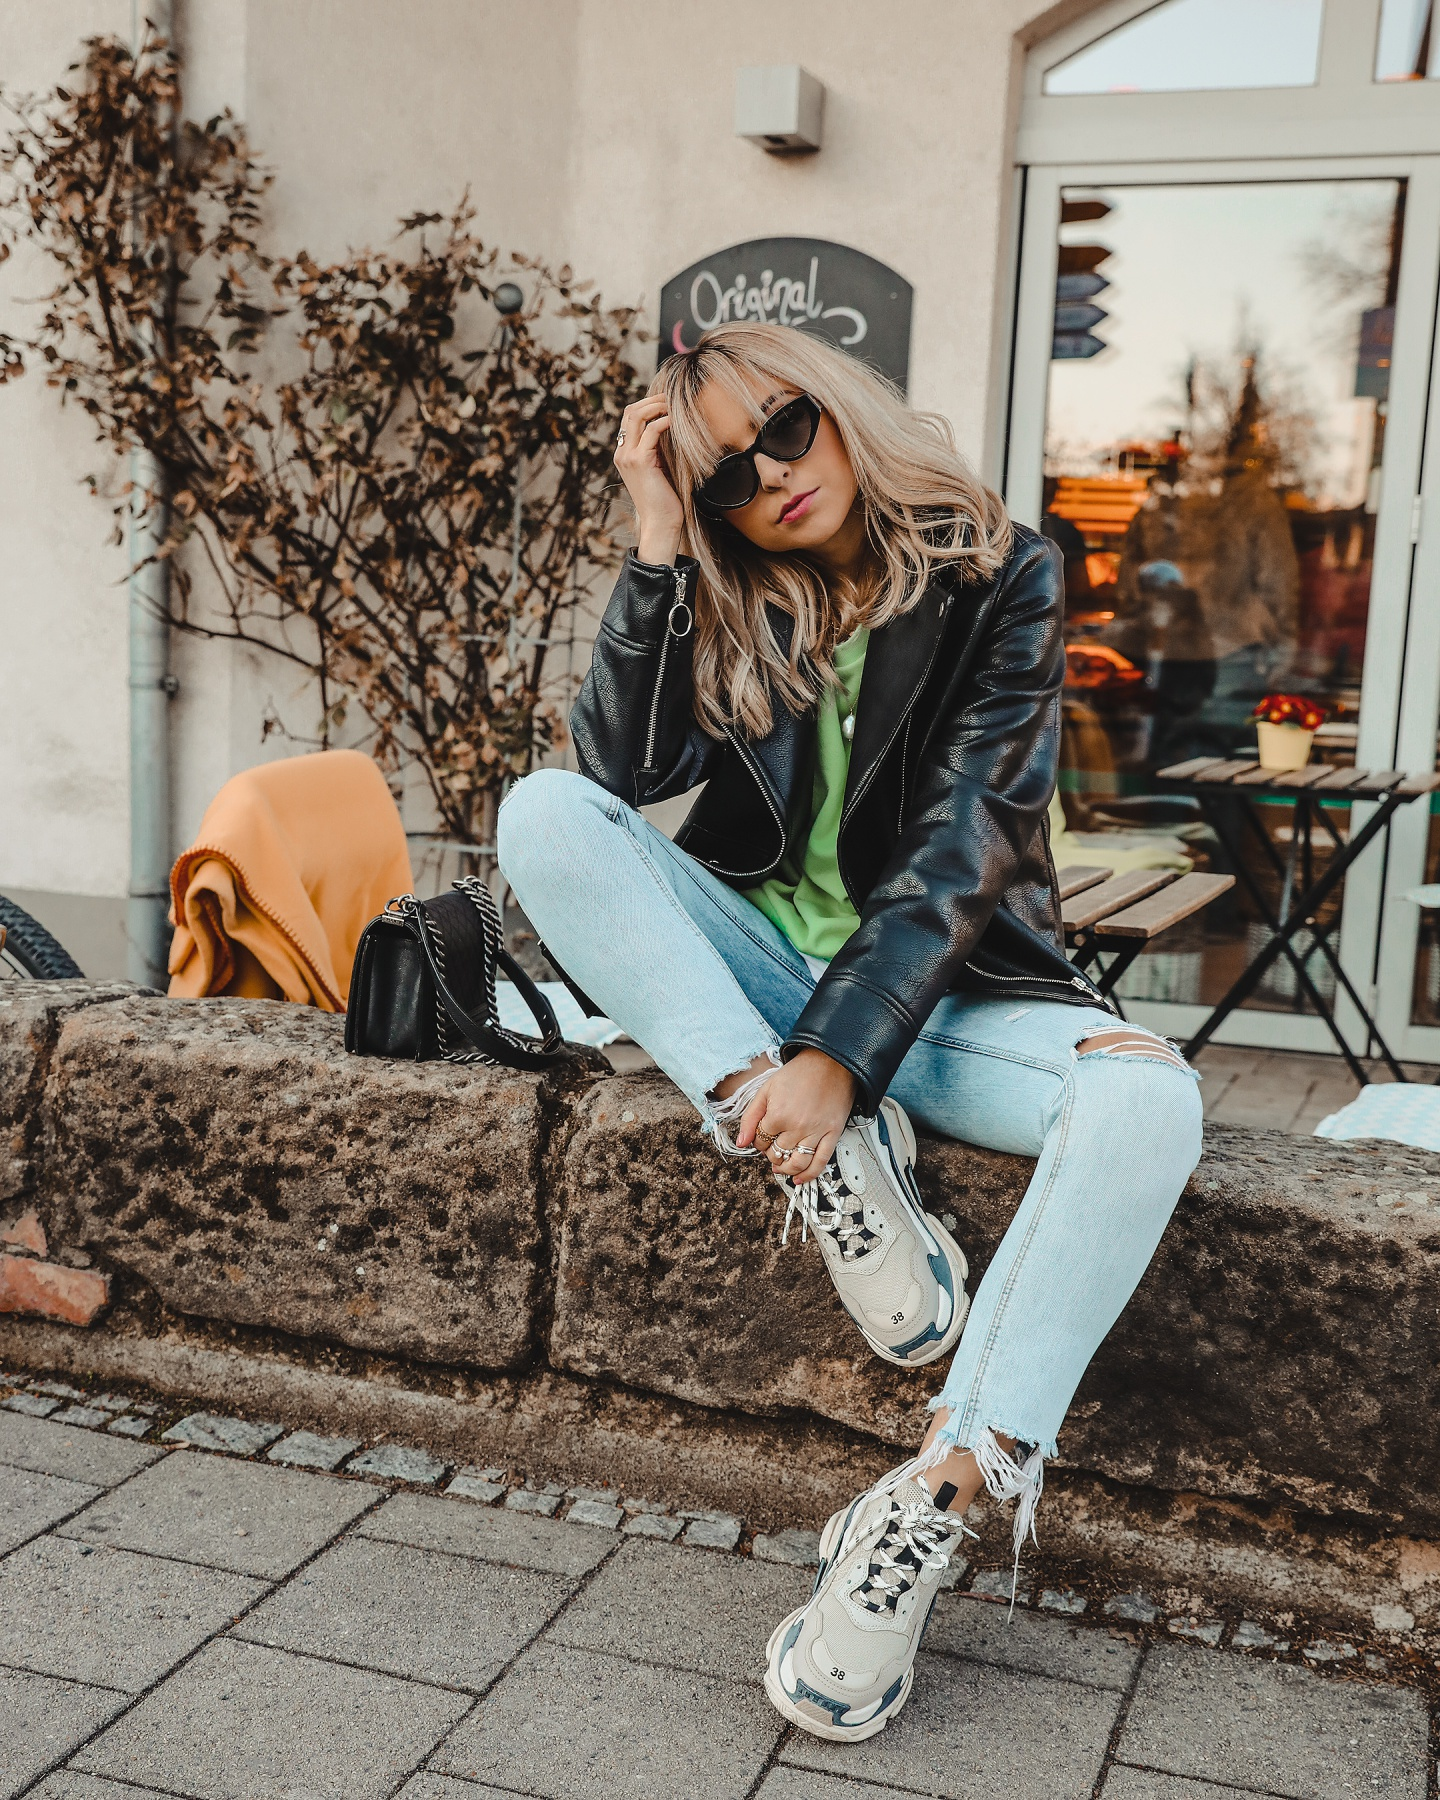 e8c71fe73512 Balenciaga Triple S Outfit Idea 2  Neon and some leather